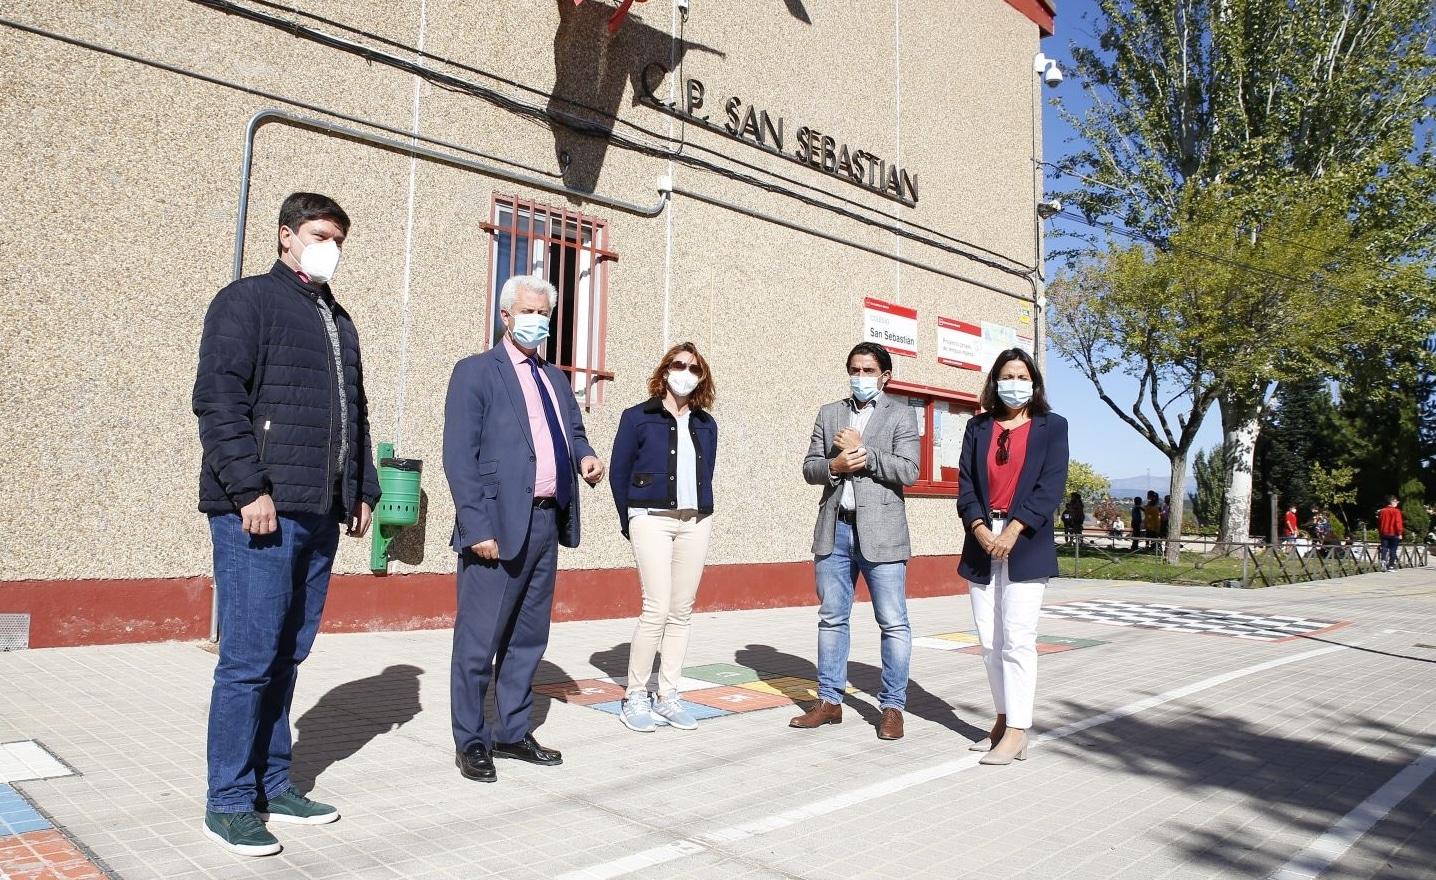 Visita colegio público San Sebastián